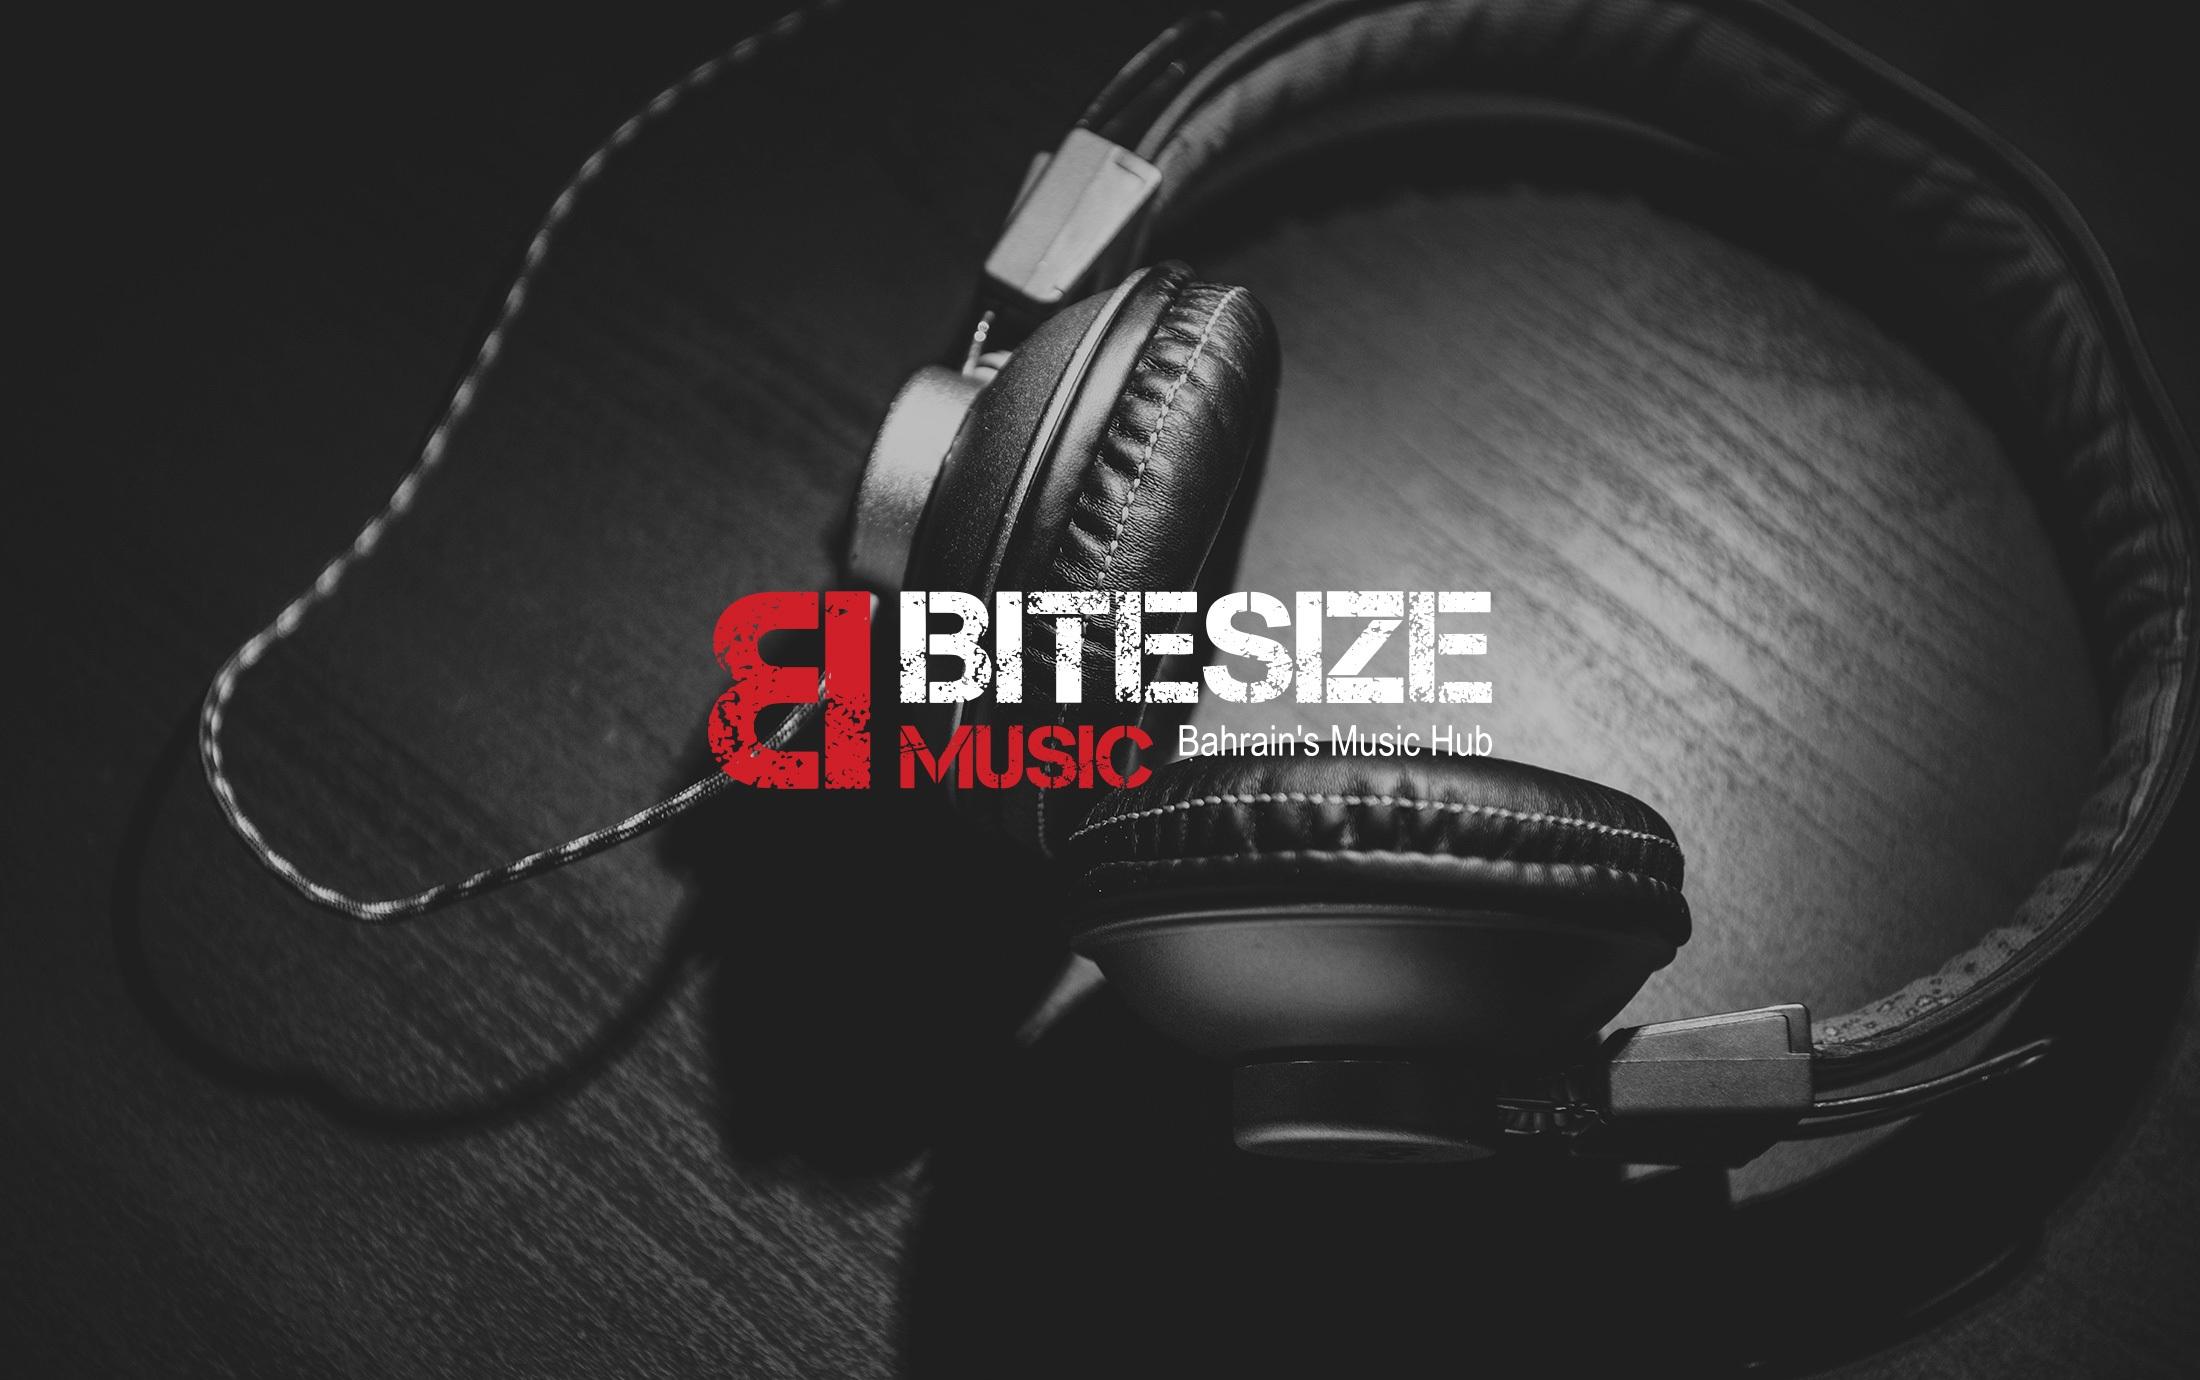 Custom website design and development services for Bitesize Music by Reform Design, Cyprus.